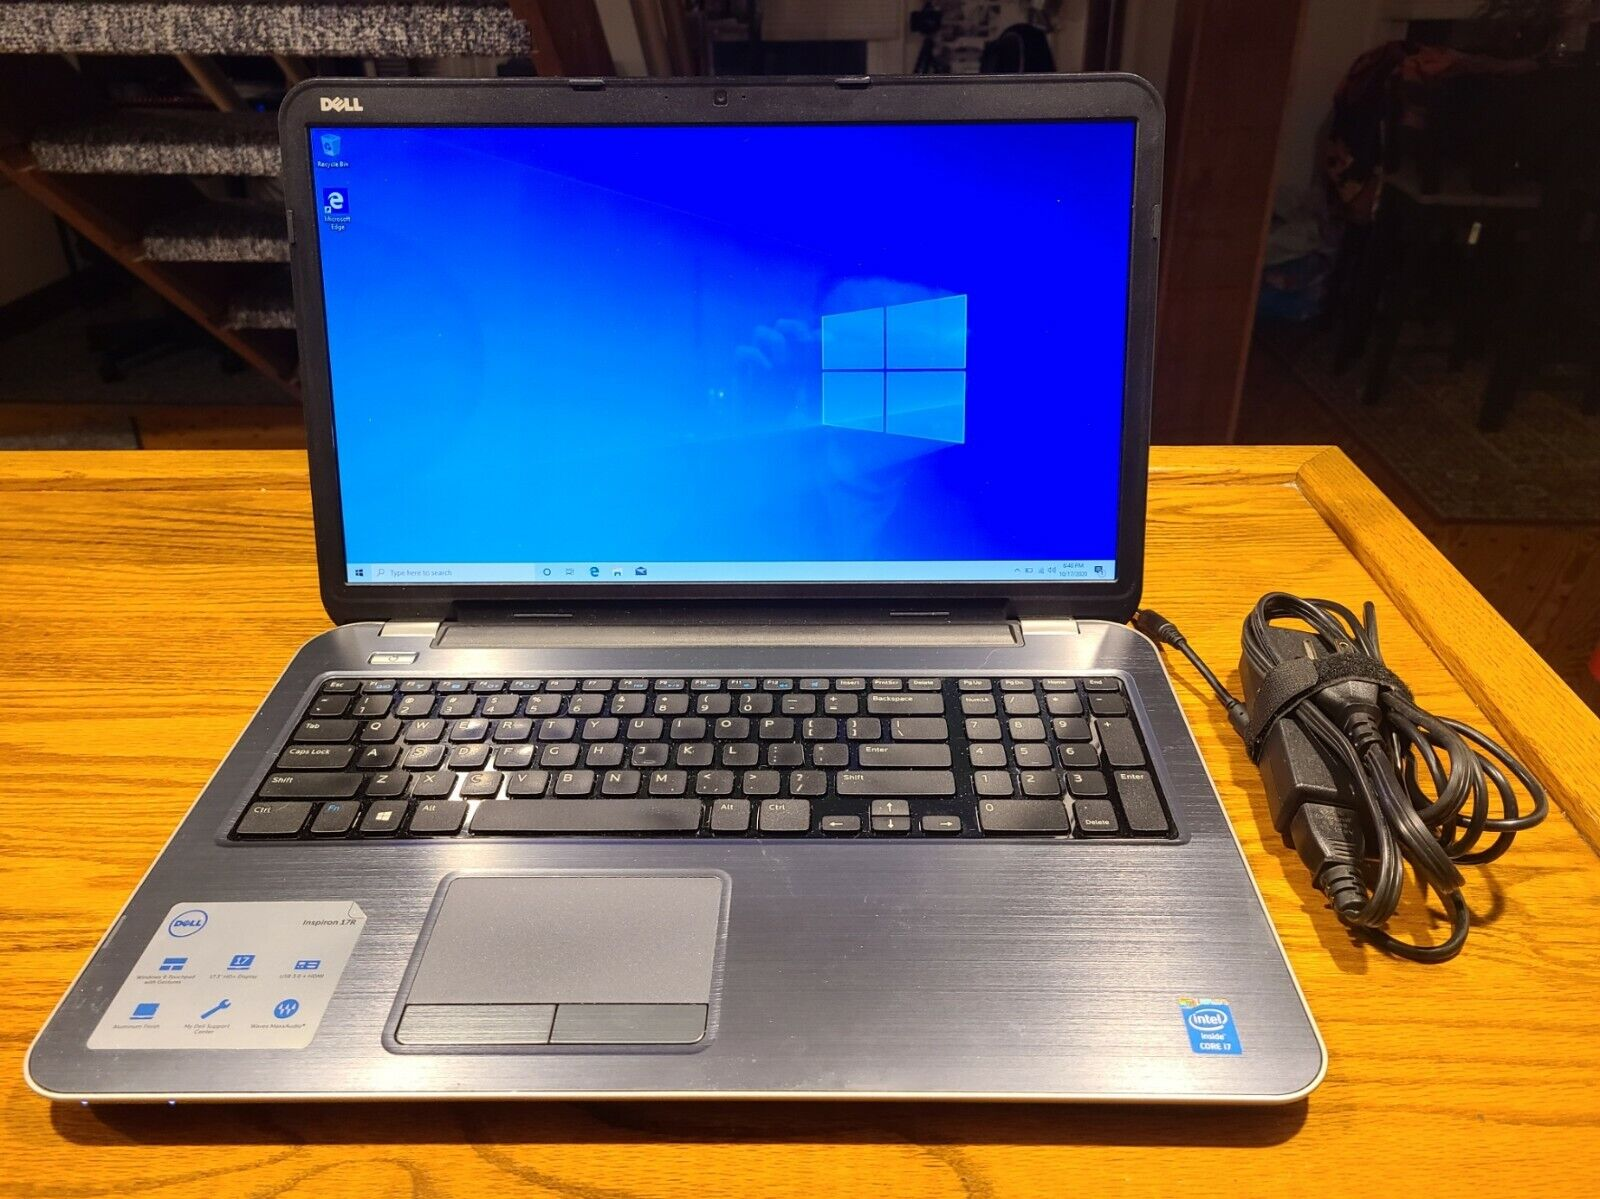 "Laptop Windows - Dell Insporn 17R - 17.3"" Laptop, i7-4500U, 6 GB RAM, 128 GB SSD, Windows 10 Home"